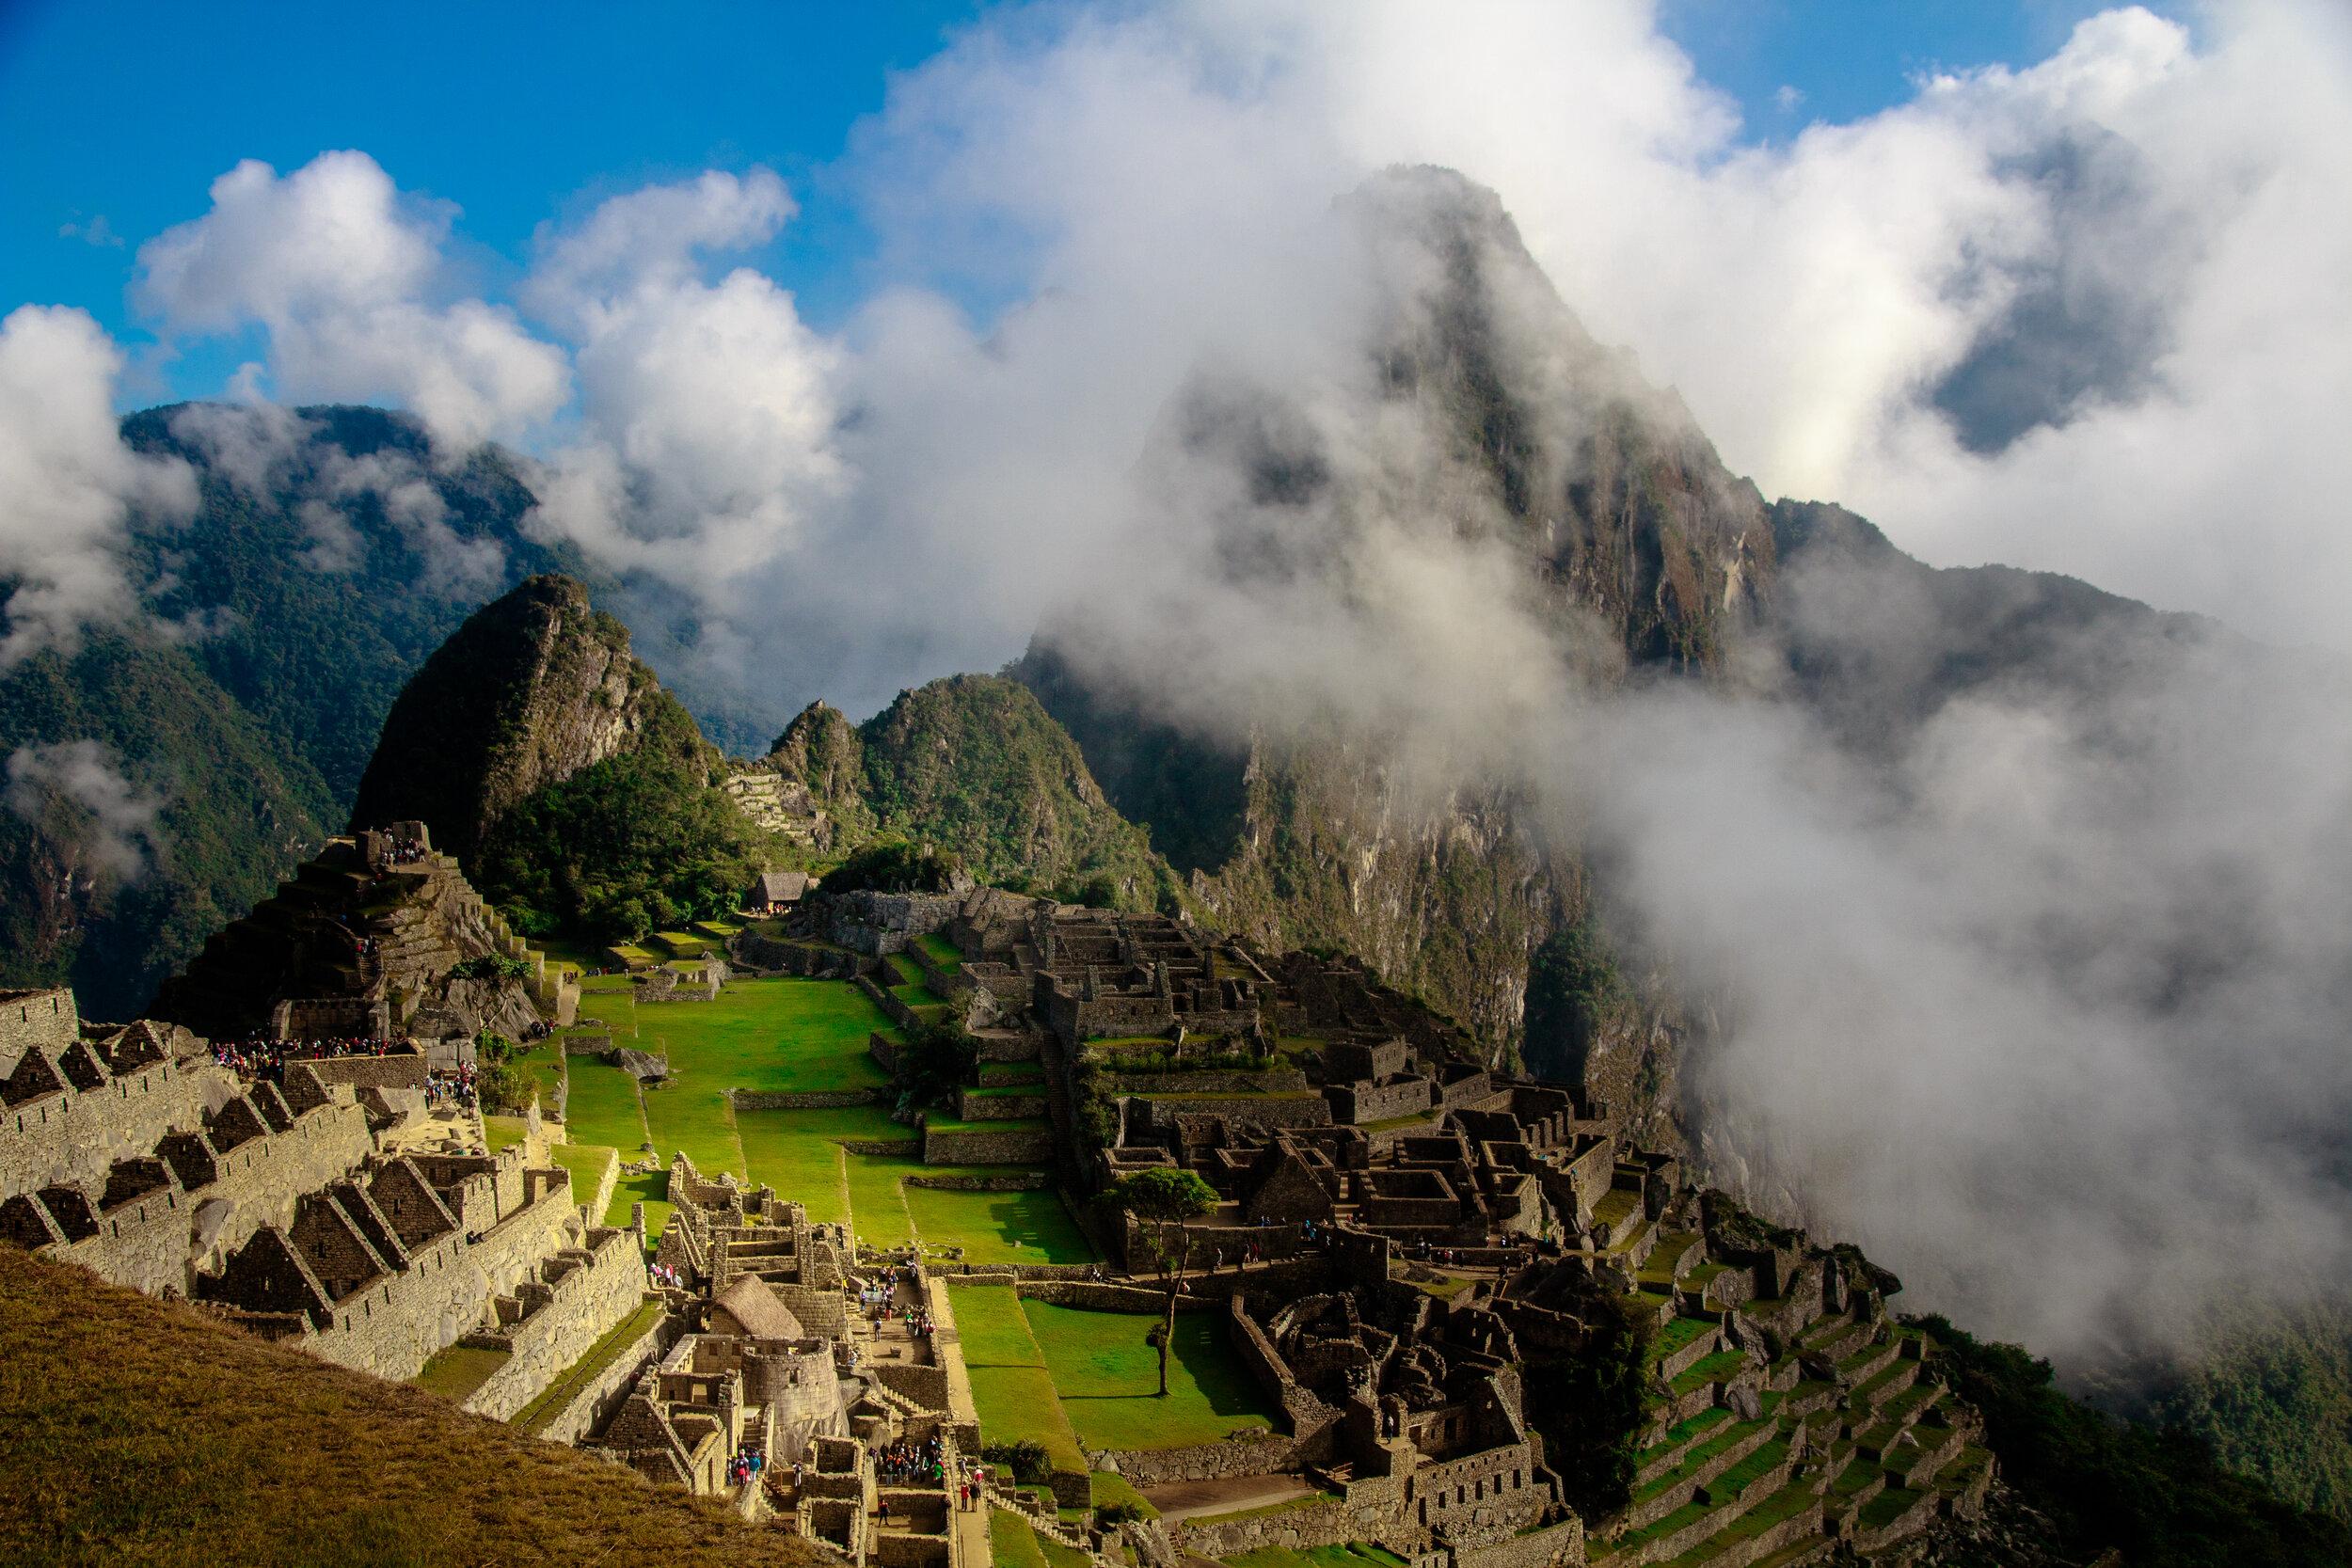 Sacred Peru - A Journey of Self-DiscoveryOctober 2020